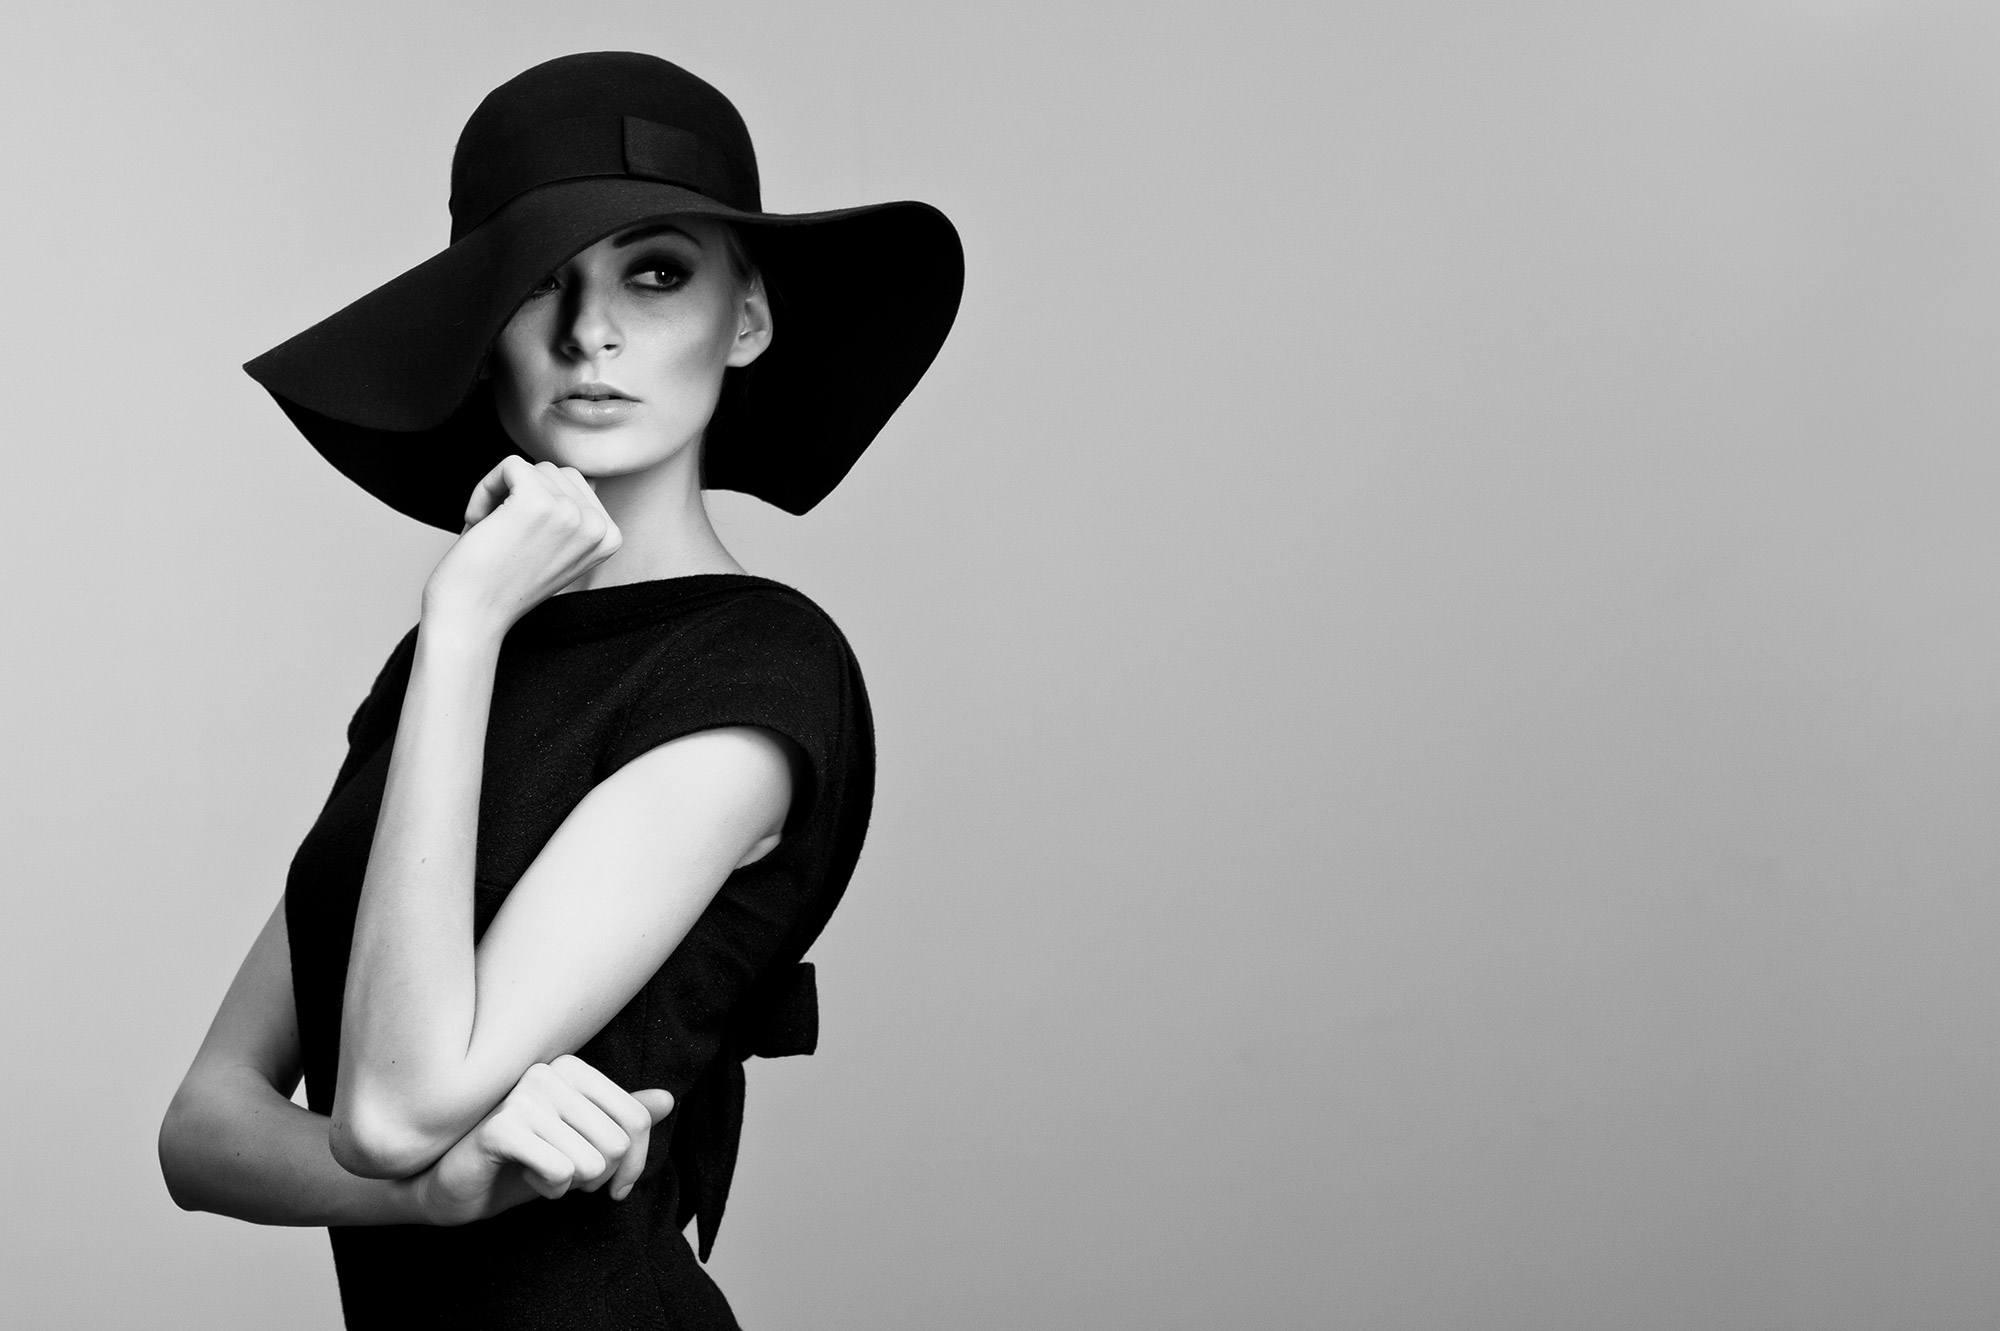 Model Photogrpahy